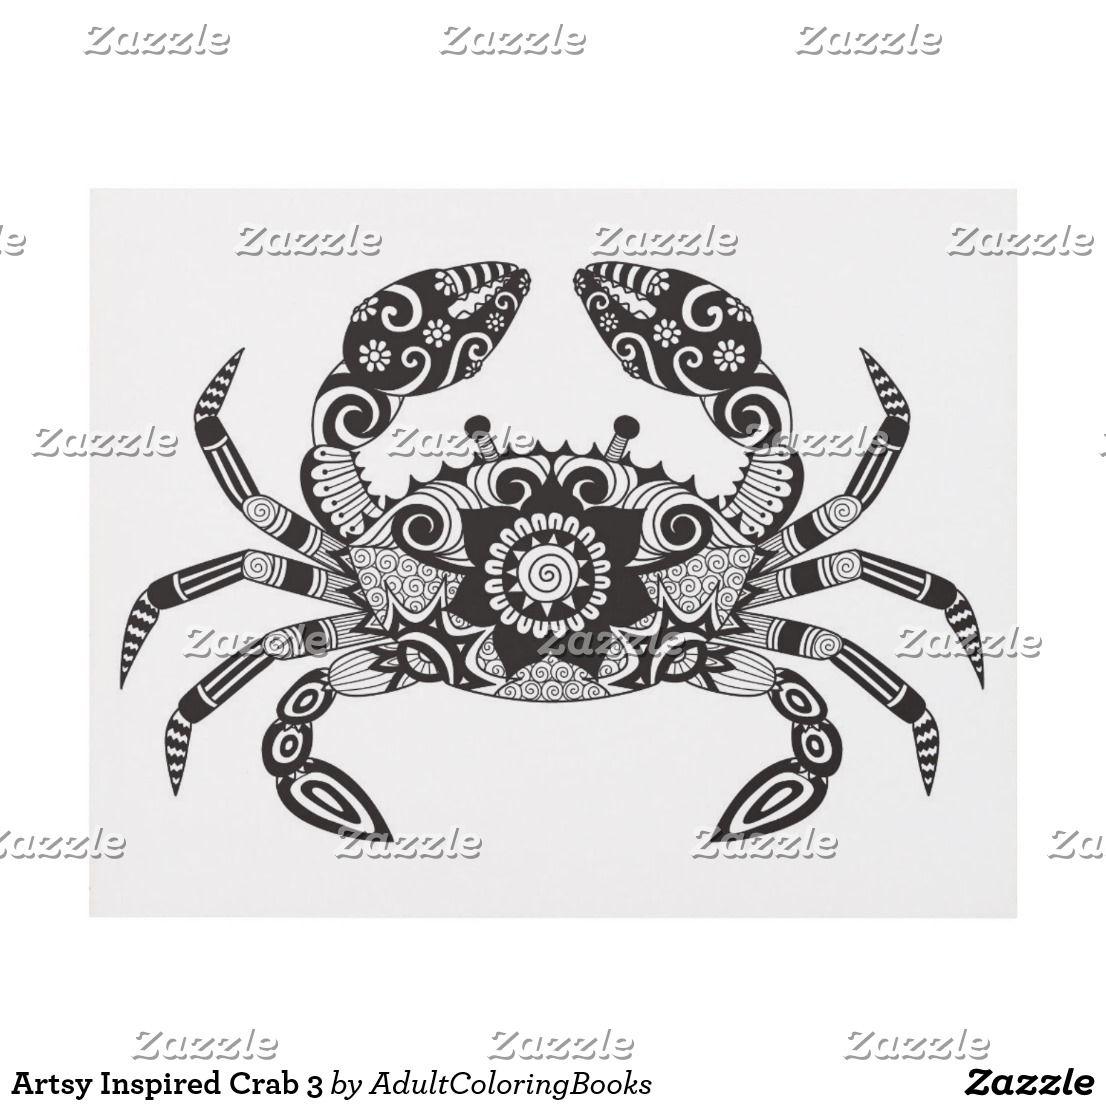 Artsy Inspired Crab 3 Panel Wall Art Pyrography patterns